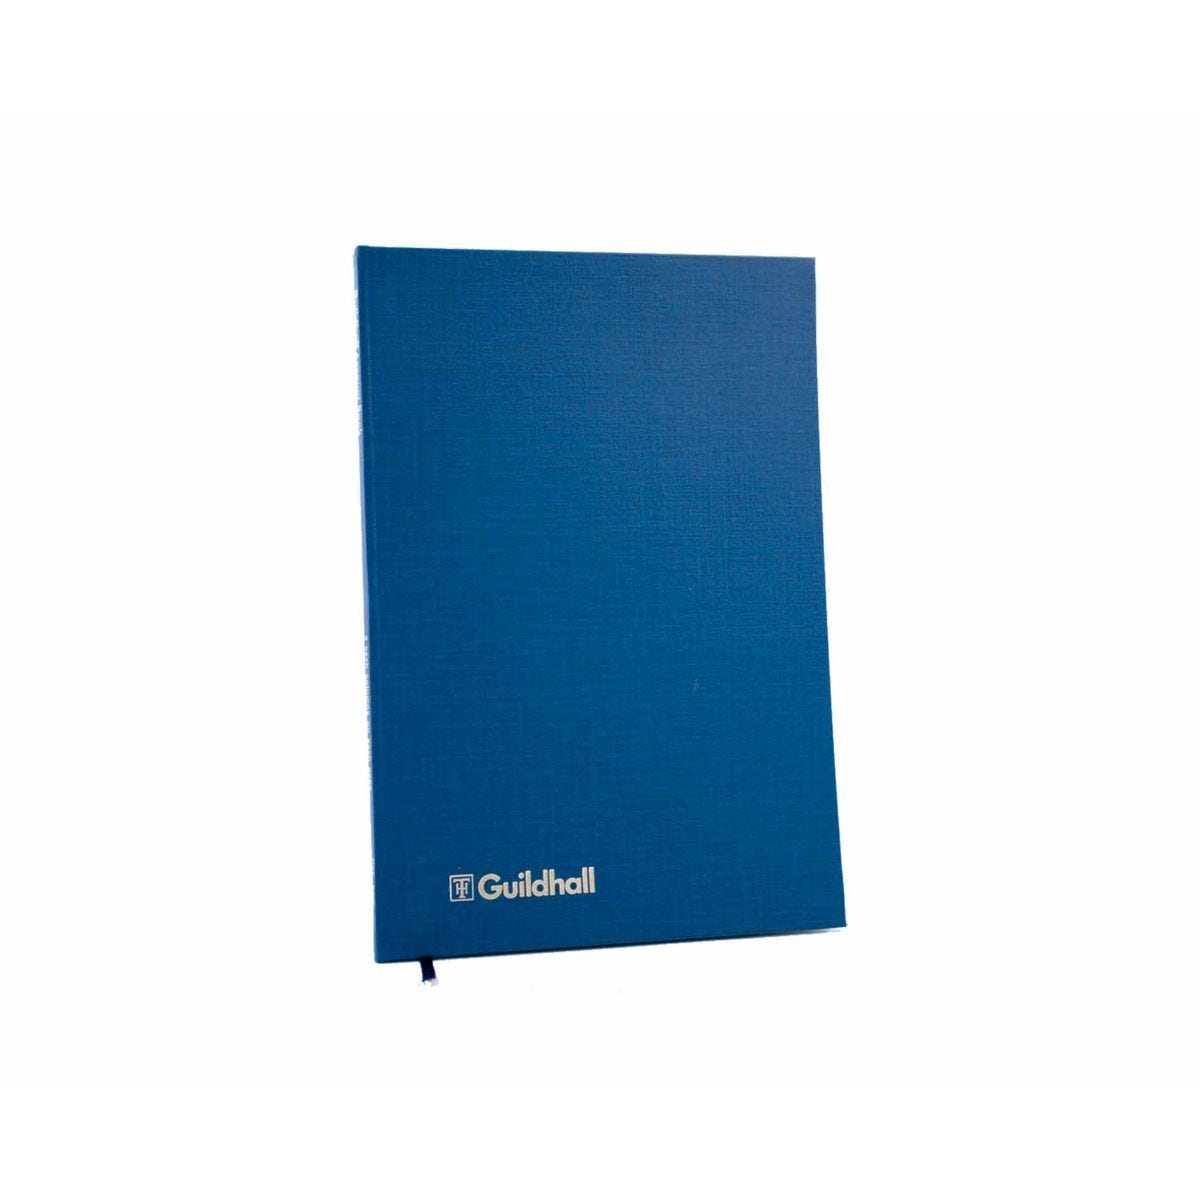 Guildhall Account Book 31 Series 3 Column A4